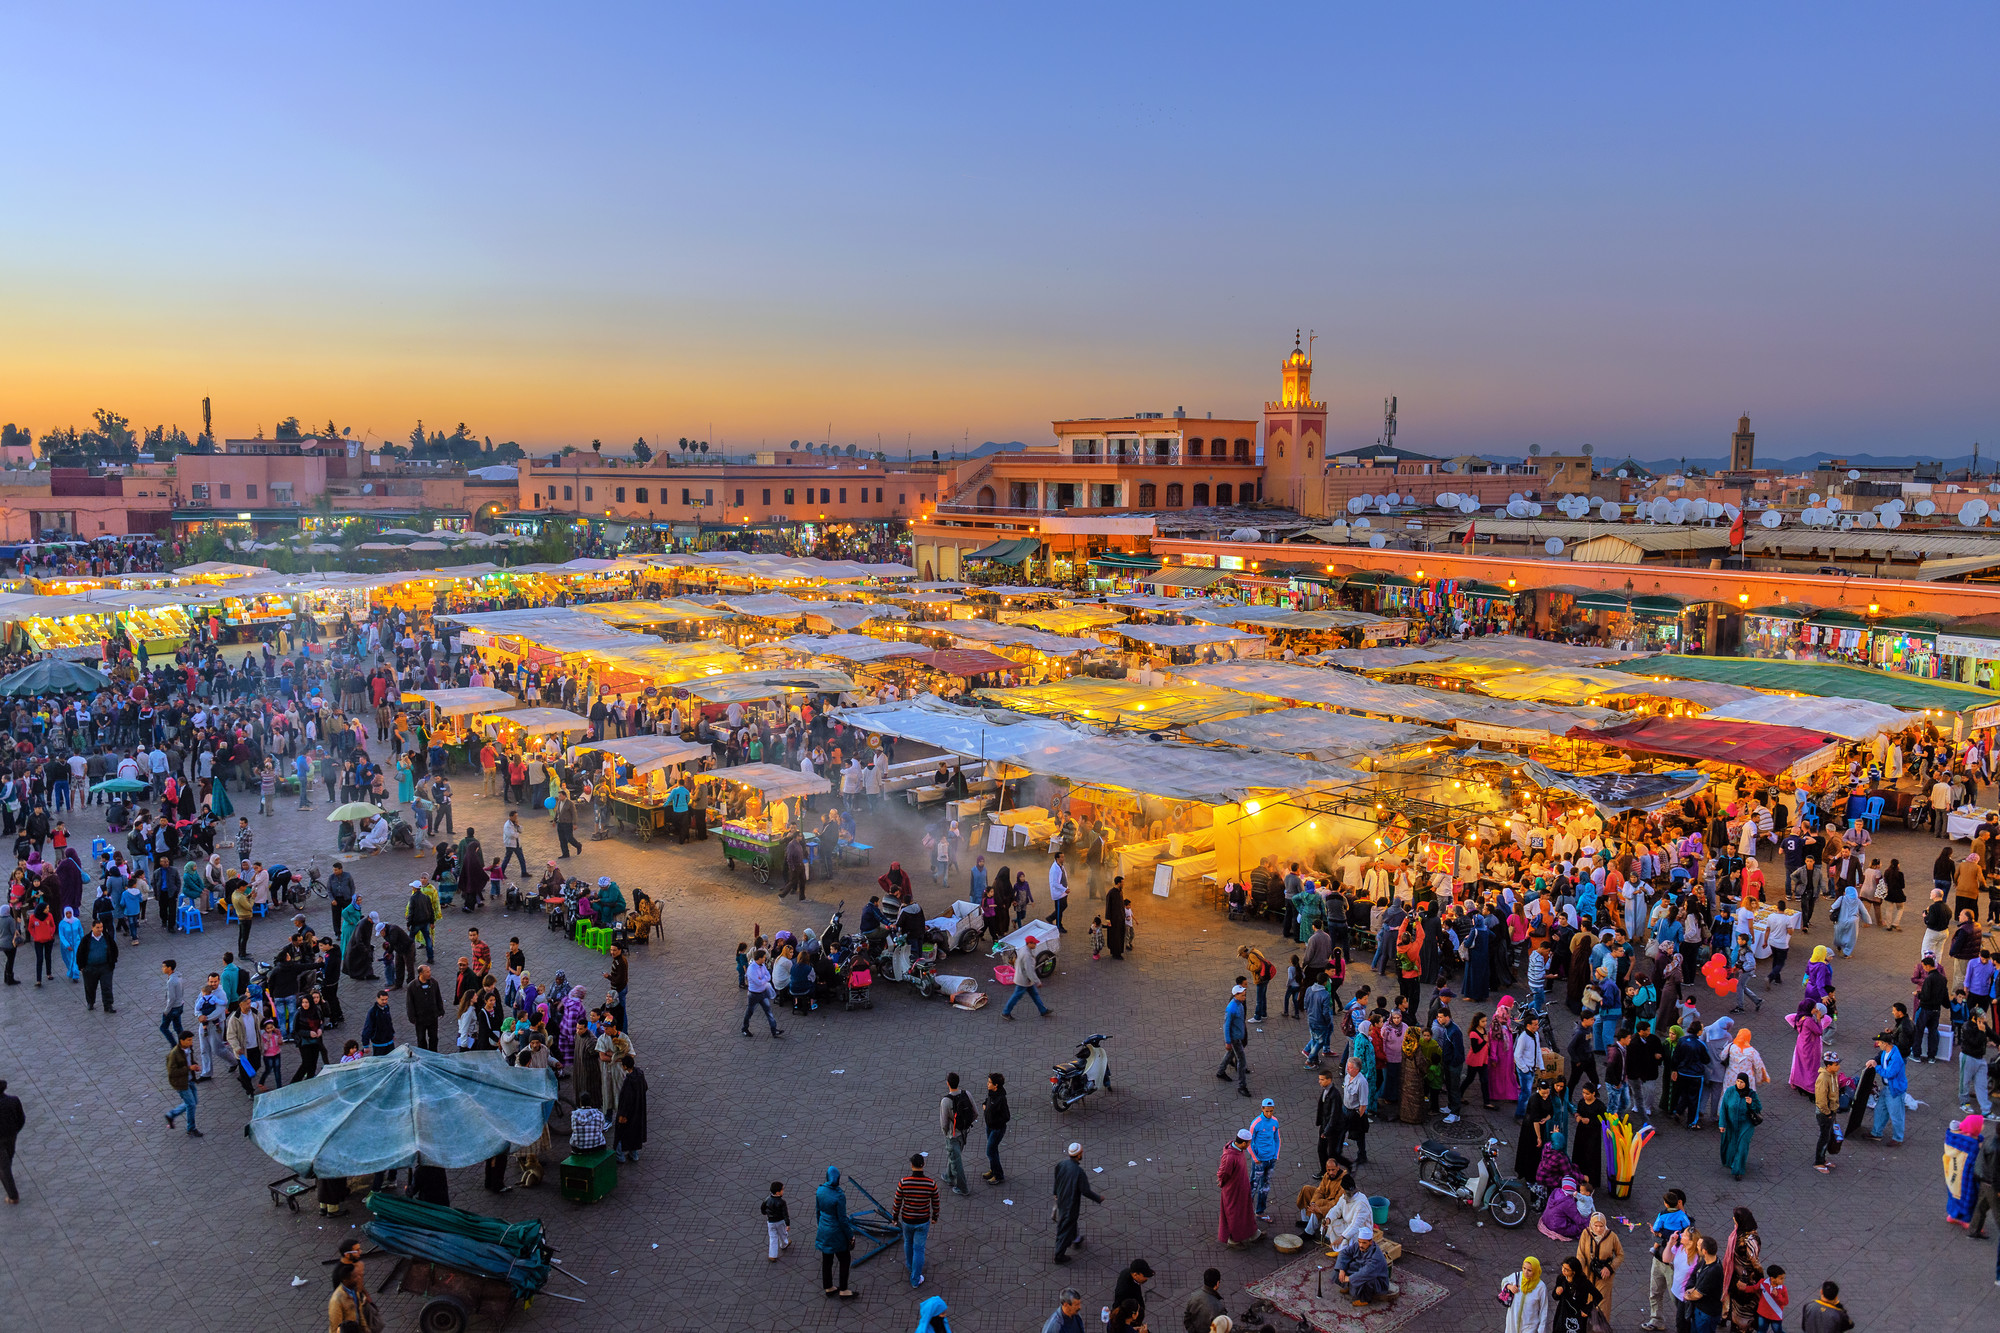 Marocko Djemaa El Fna Square Marrakech